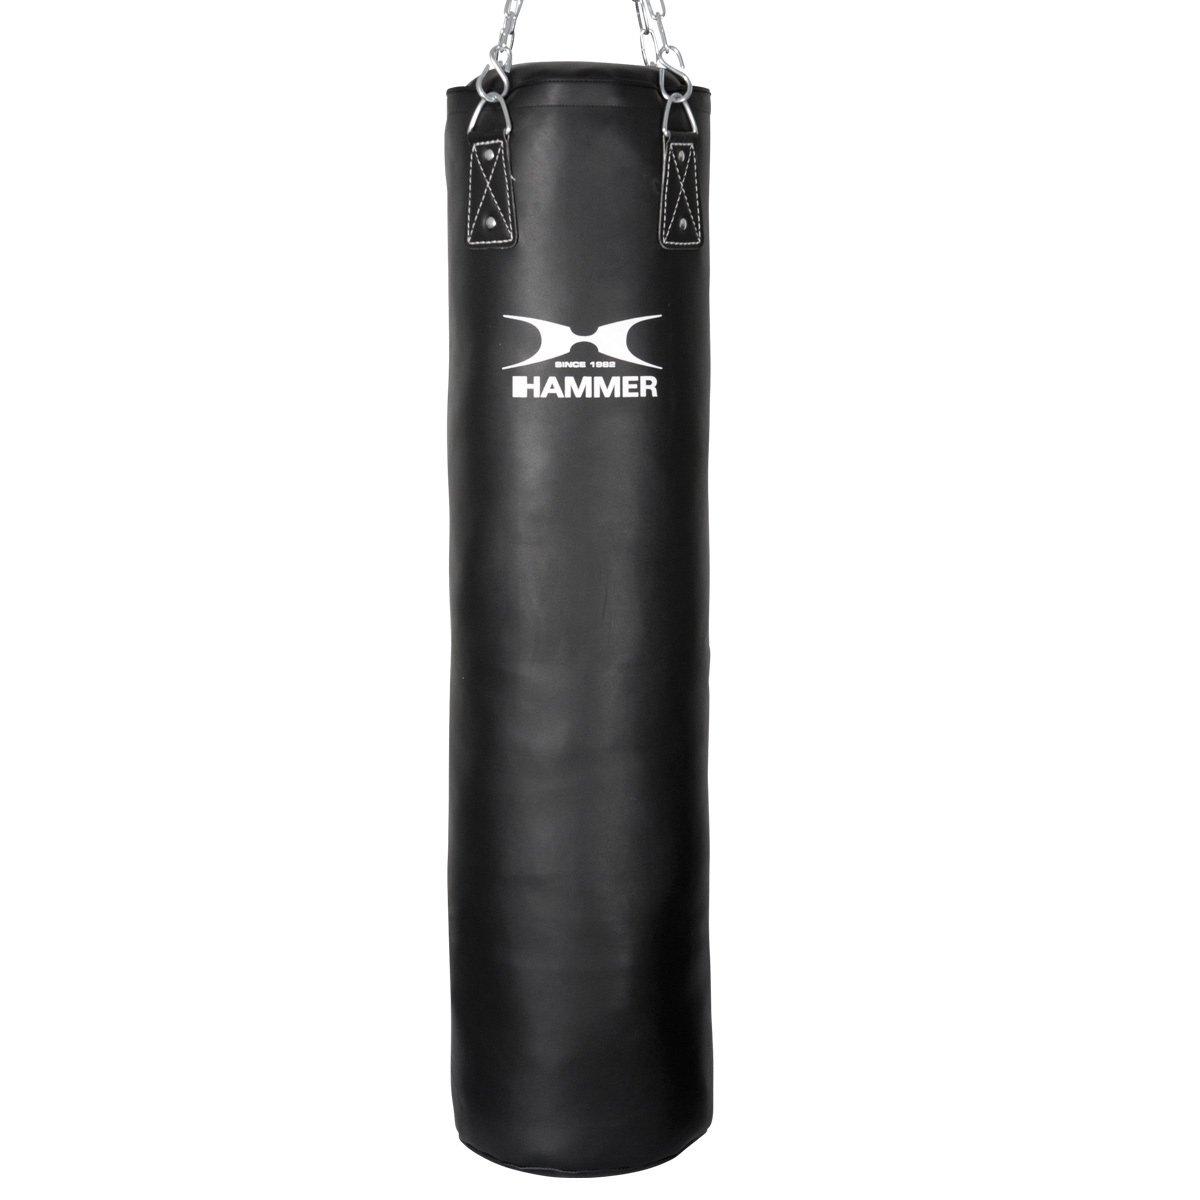 Hammer Boxsack Black Kick kaufen bei amazon